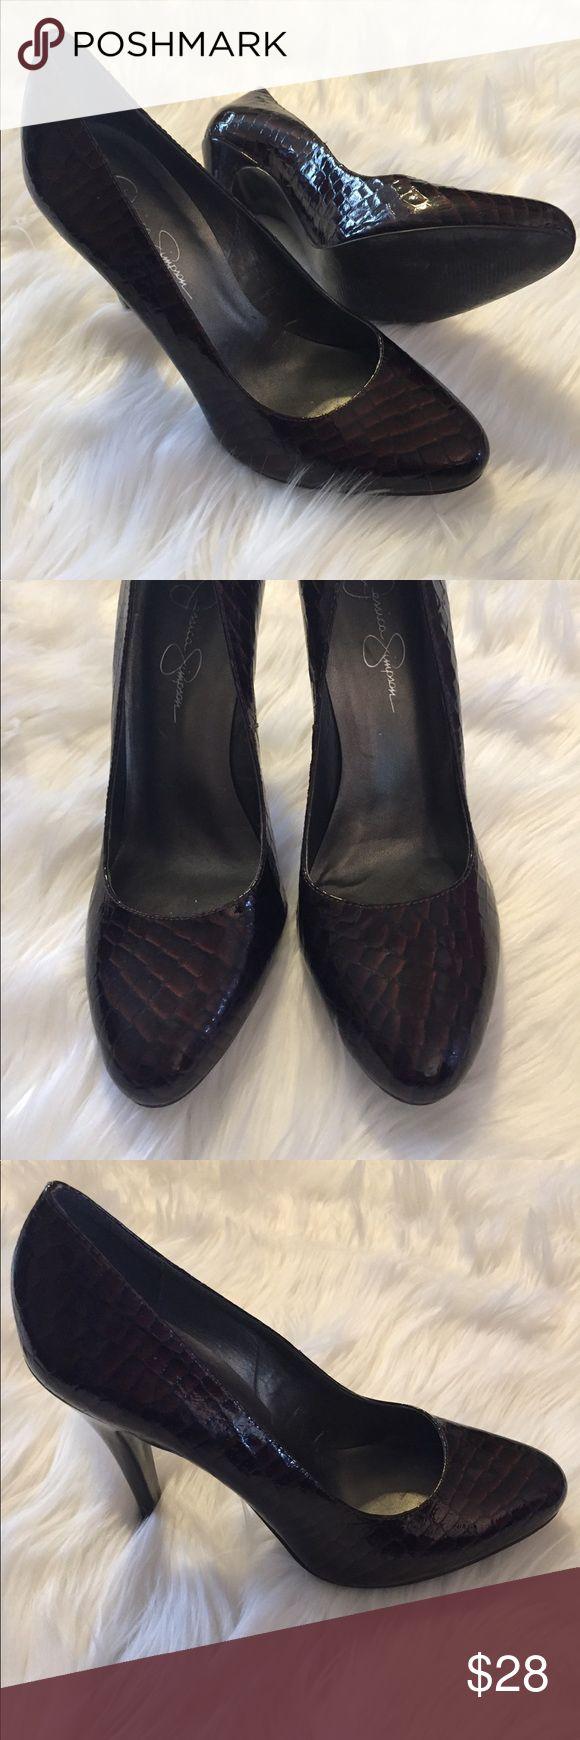 JESSICA SIMPSON brown pumps Brown pumps. 5 in heel height. Great condition! Embossed crocodile print. Jessica Simpson Shoes Heels